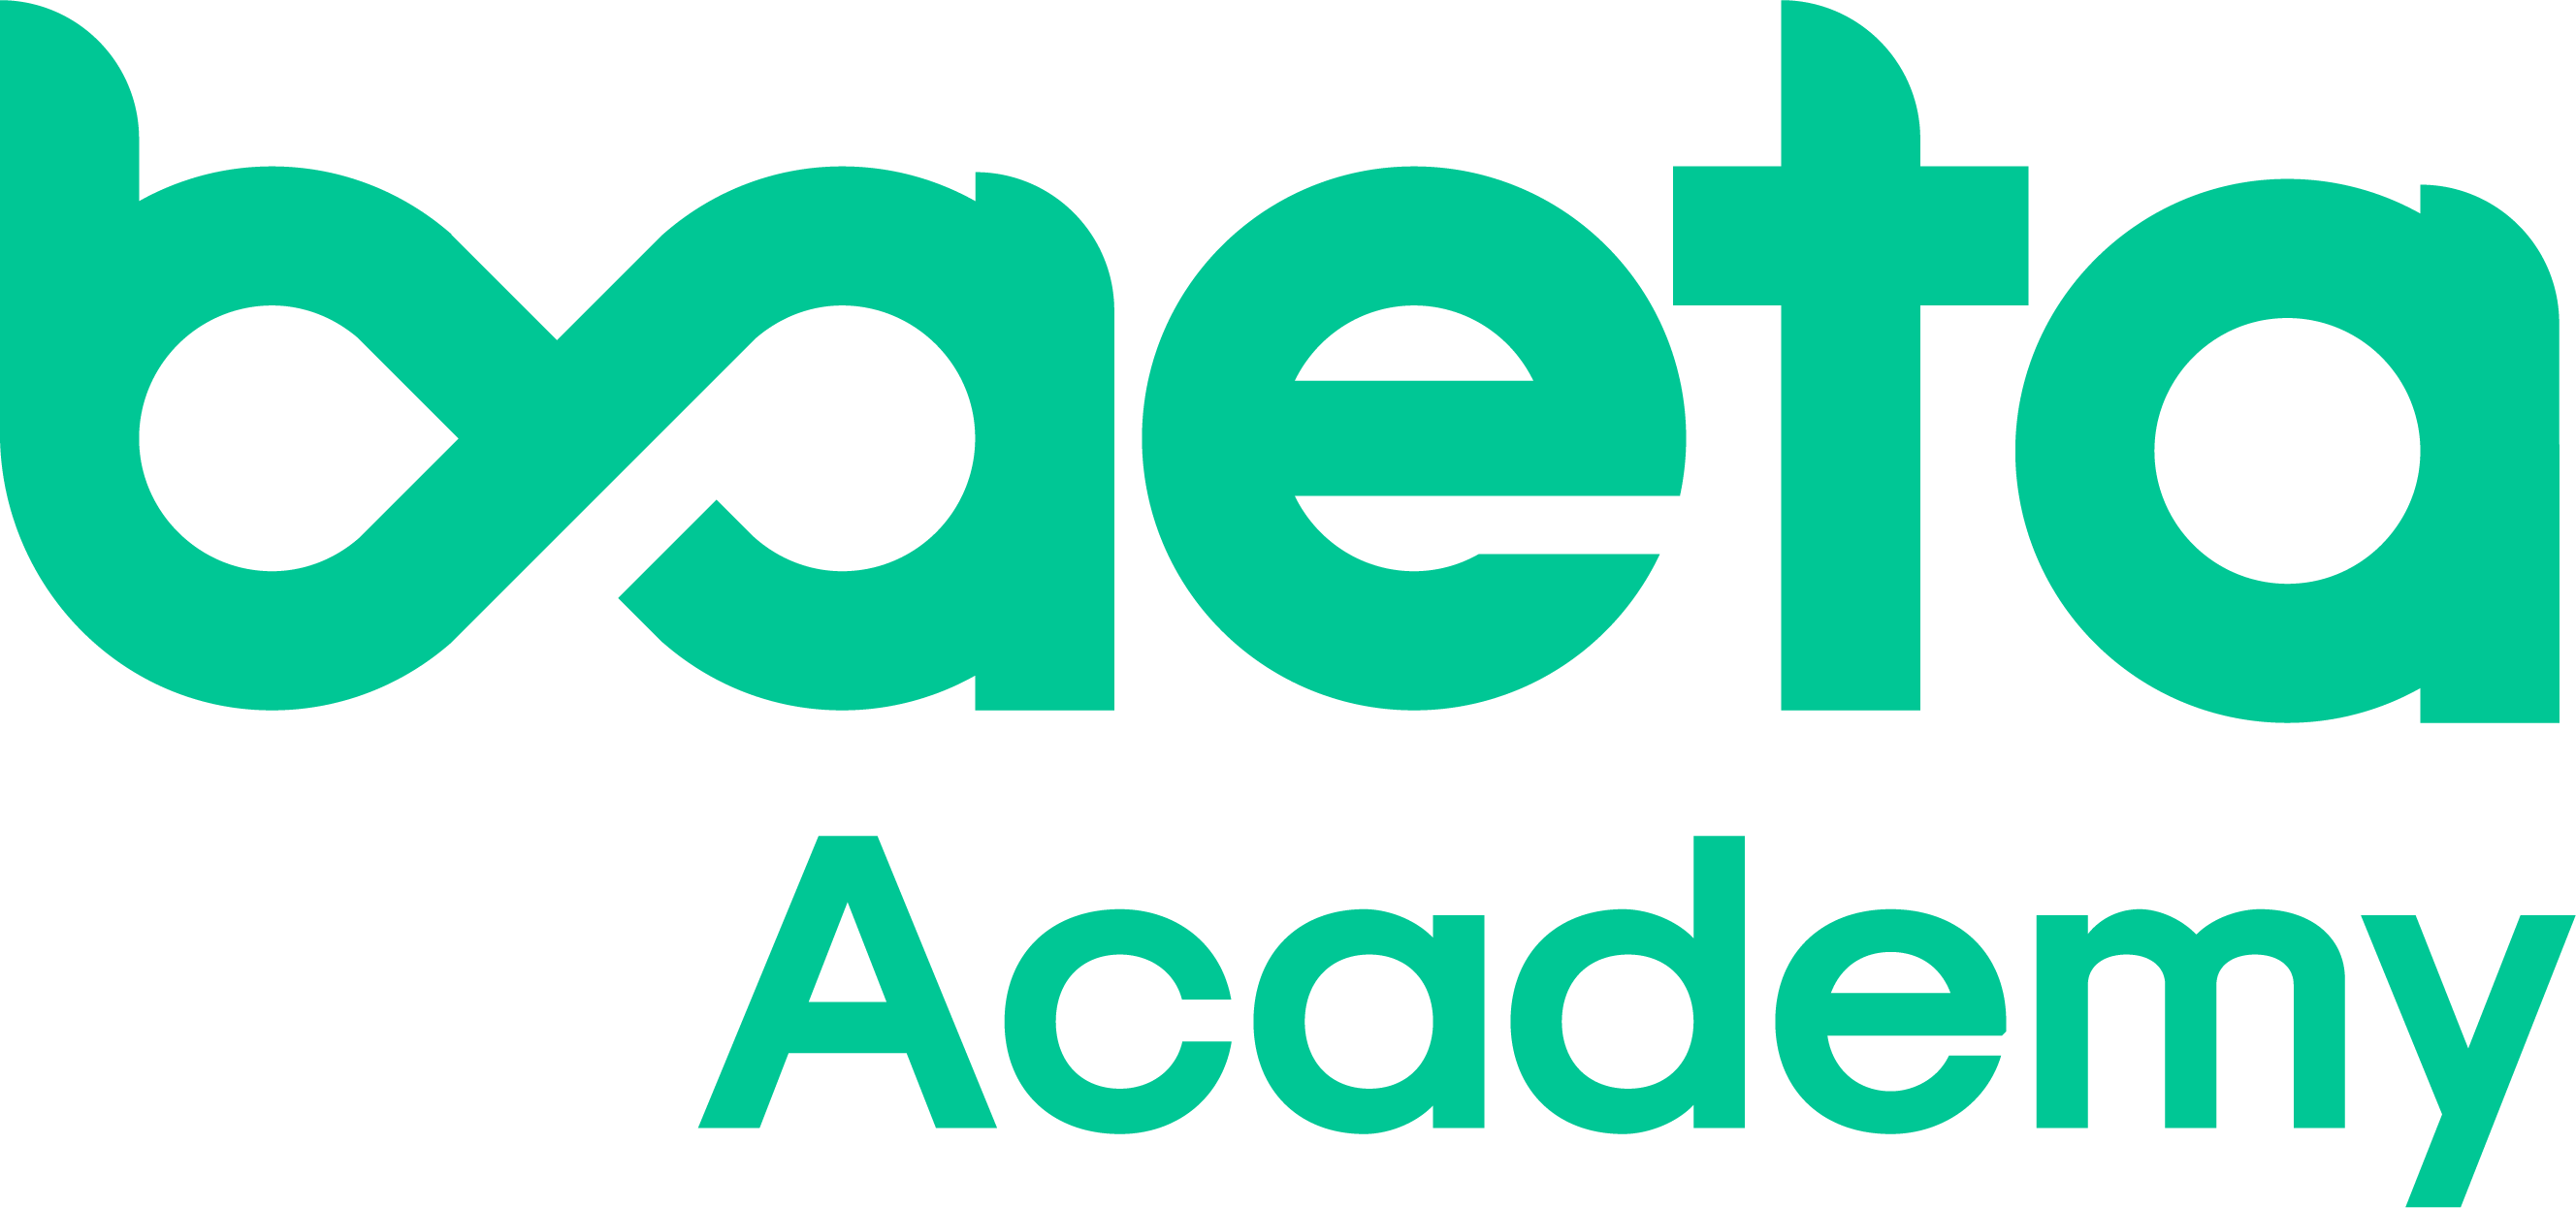 Baeta Academy